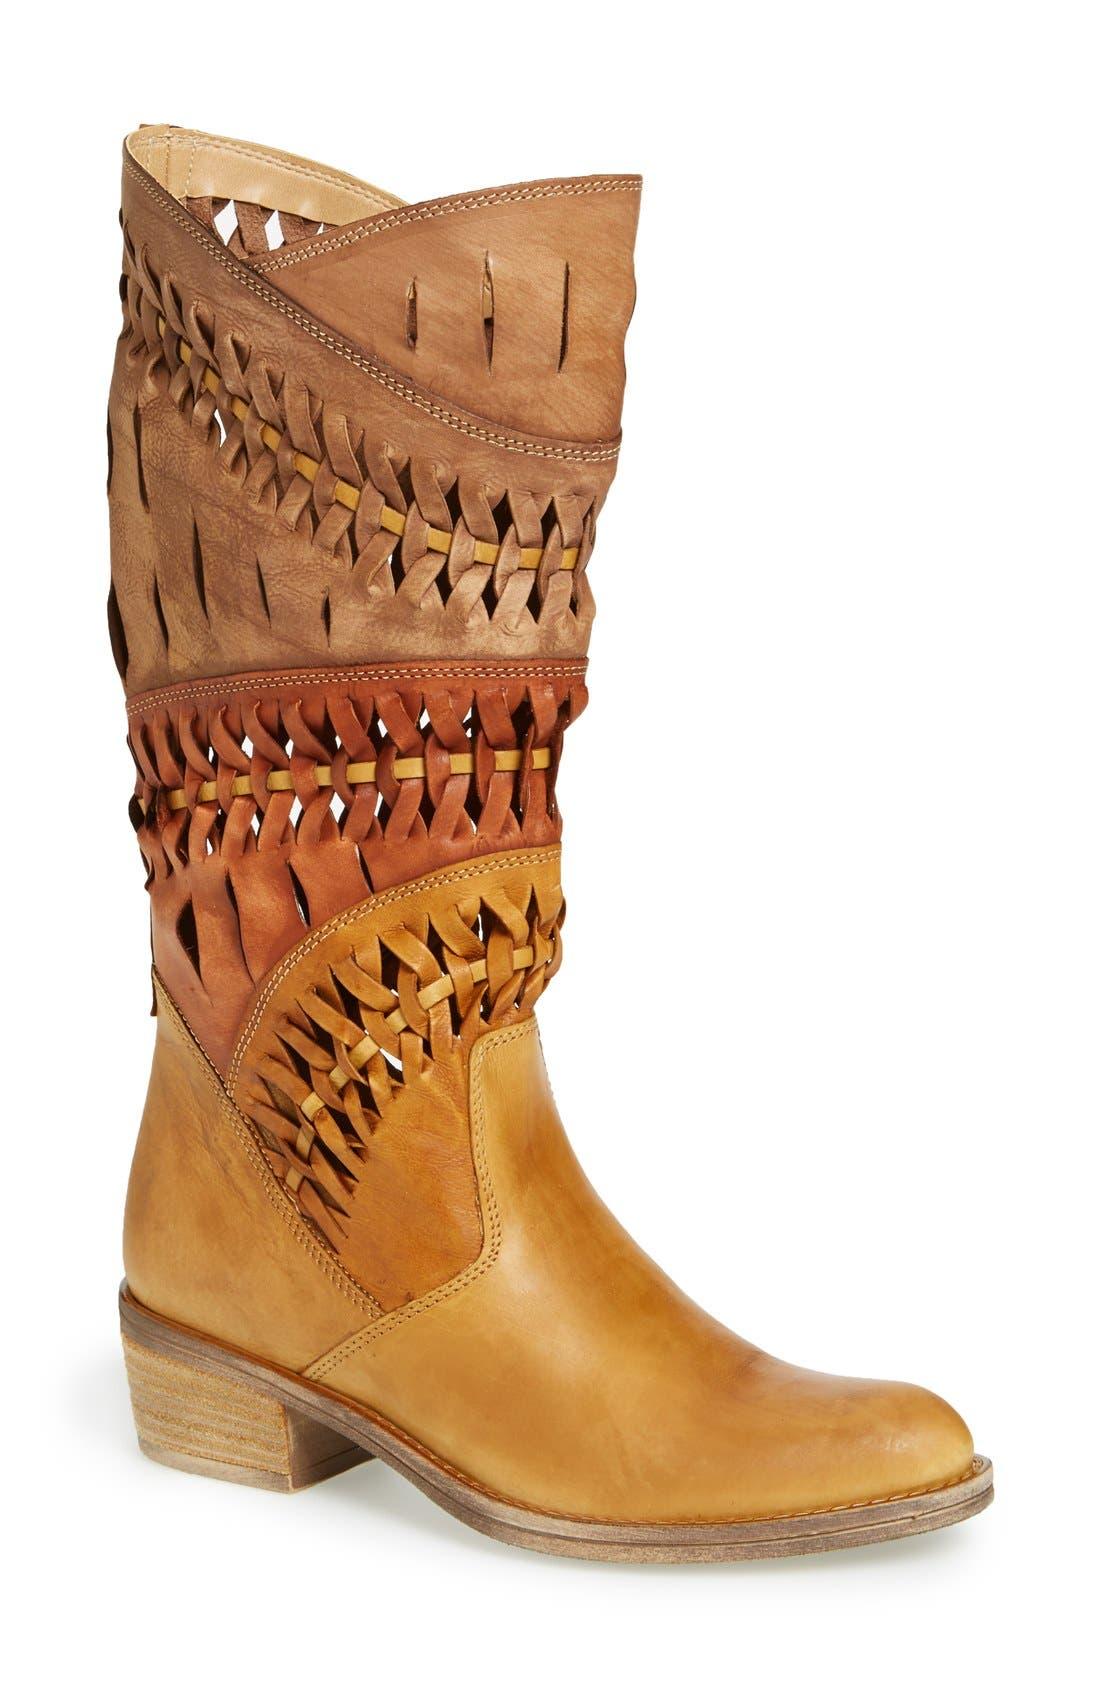 Alternate Image 1 Selected - Summit 'Tulia' Leather Western Boot (Women)